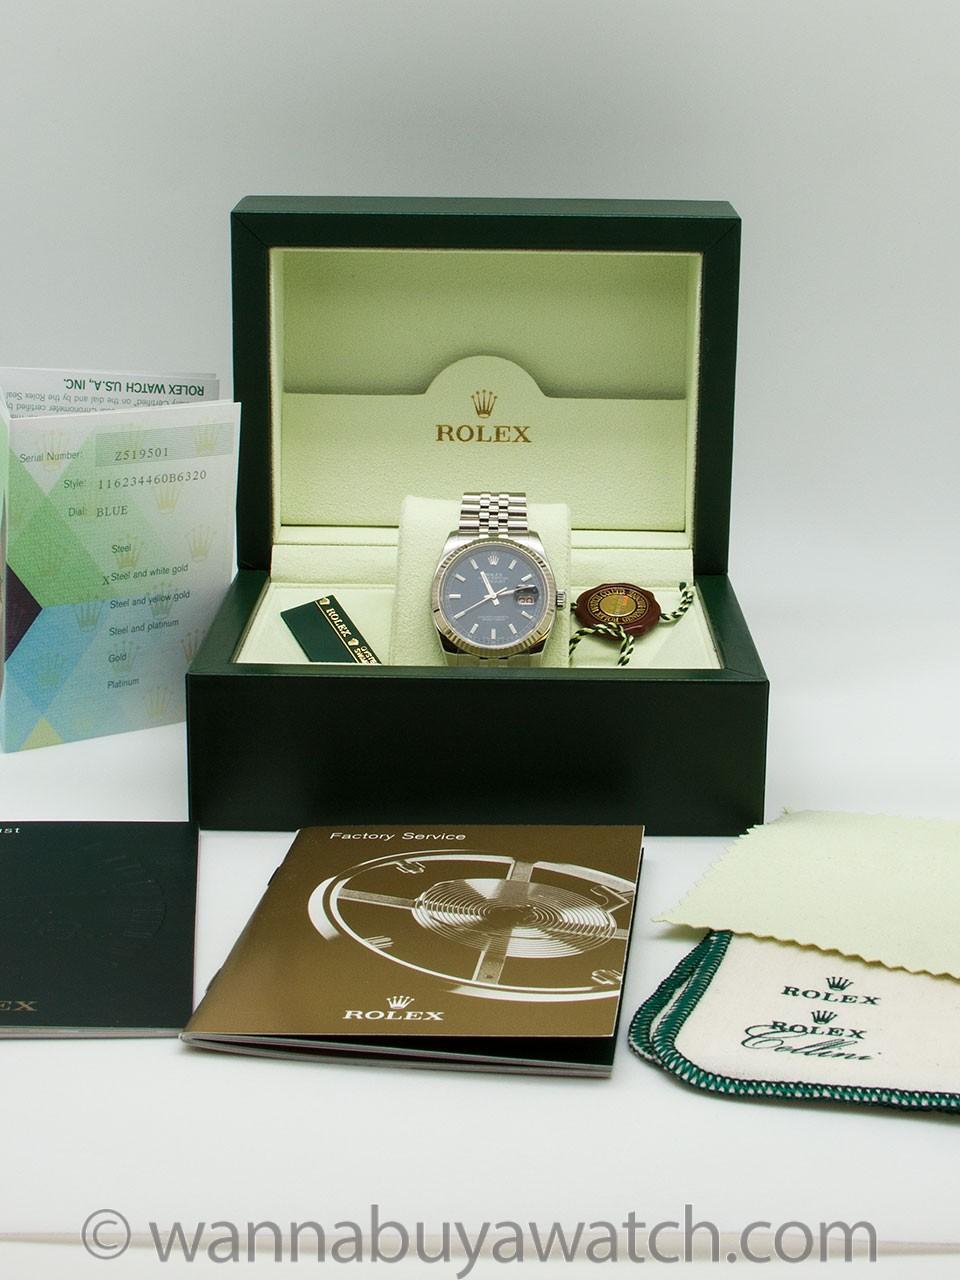 Rolex SS Datejust ref # 116234 circa 2007 B & P